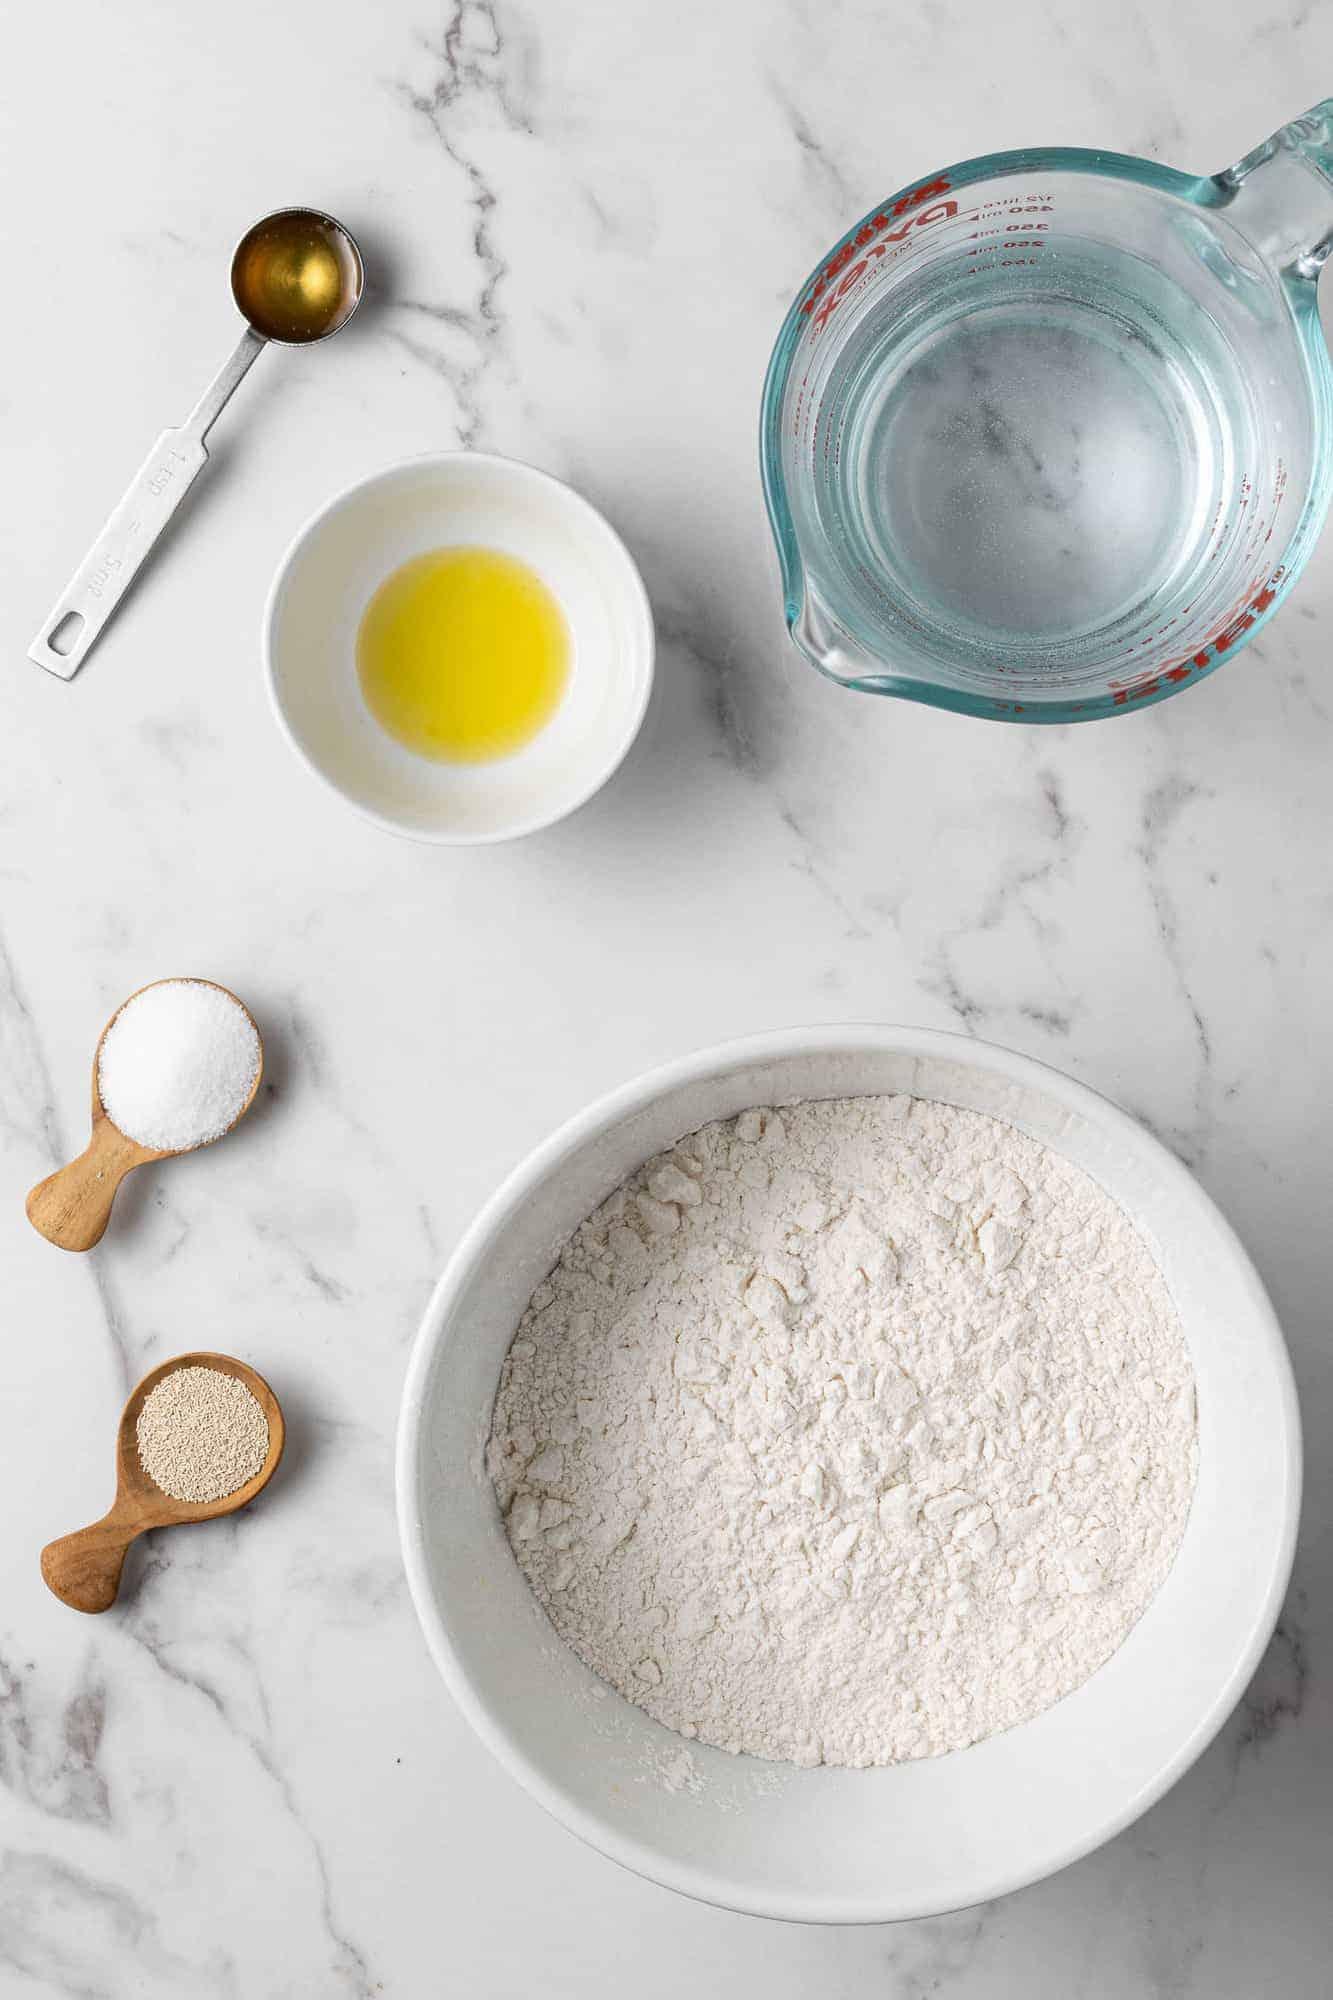 Overhead view of ingredients needed to make dutch oven bread: flour, oil, yeast, water, salt, honey.